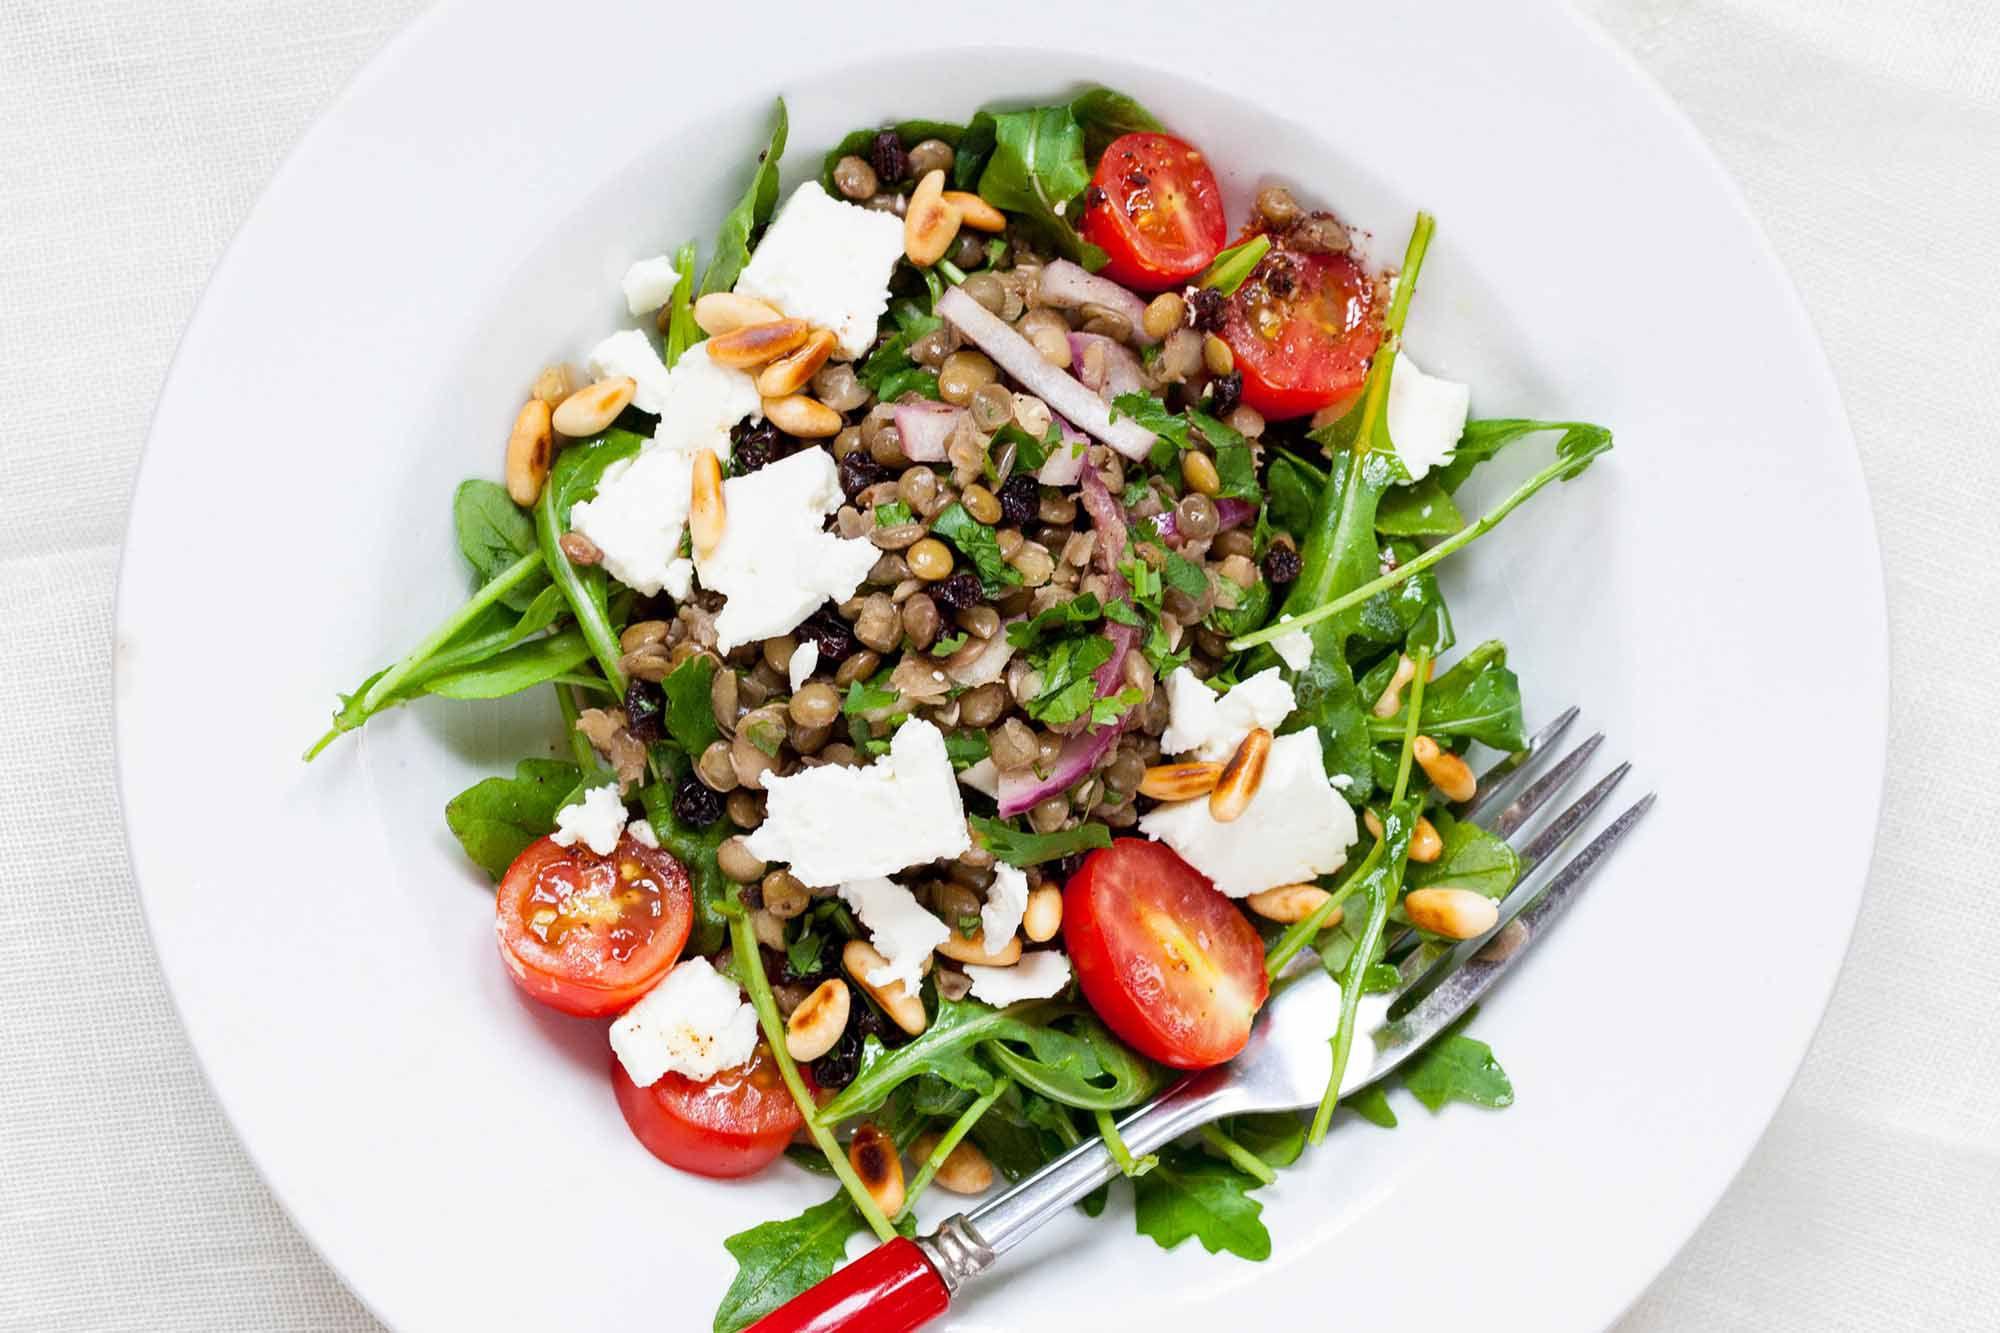 Lentil Salad with Arugula and Feta